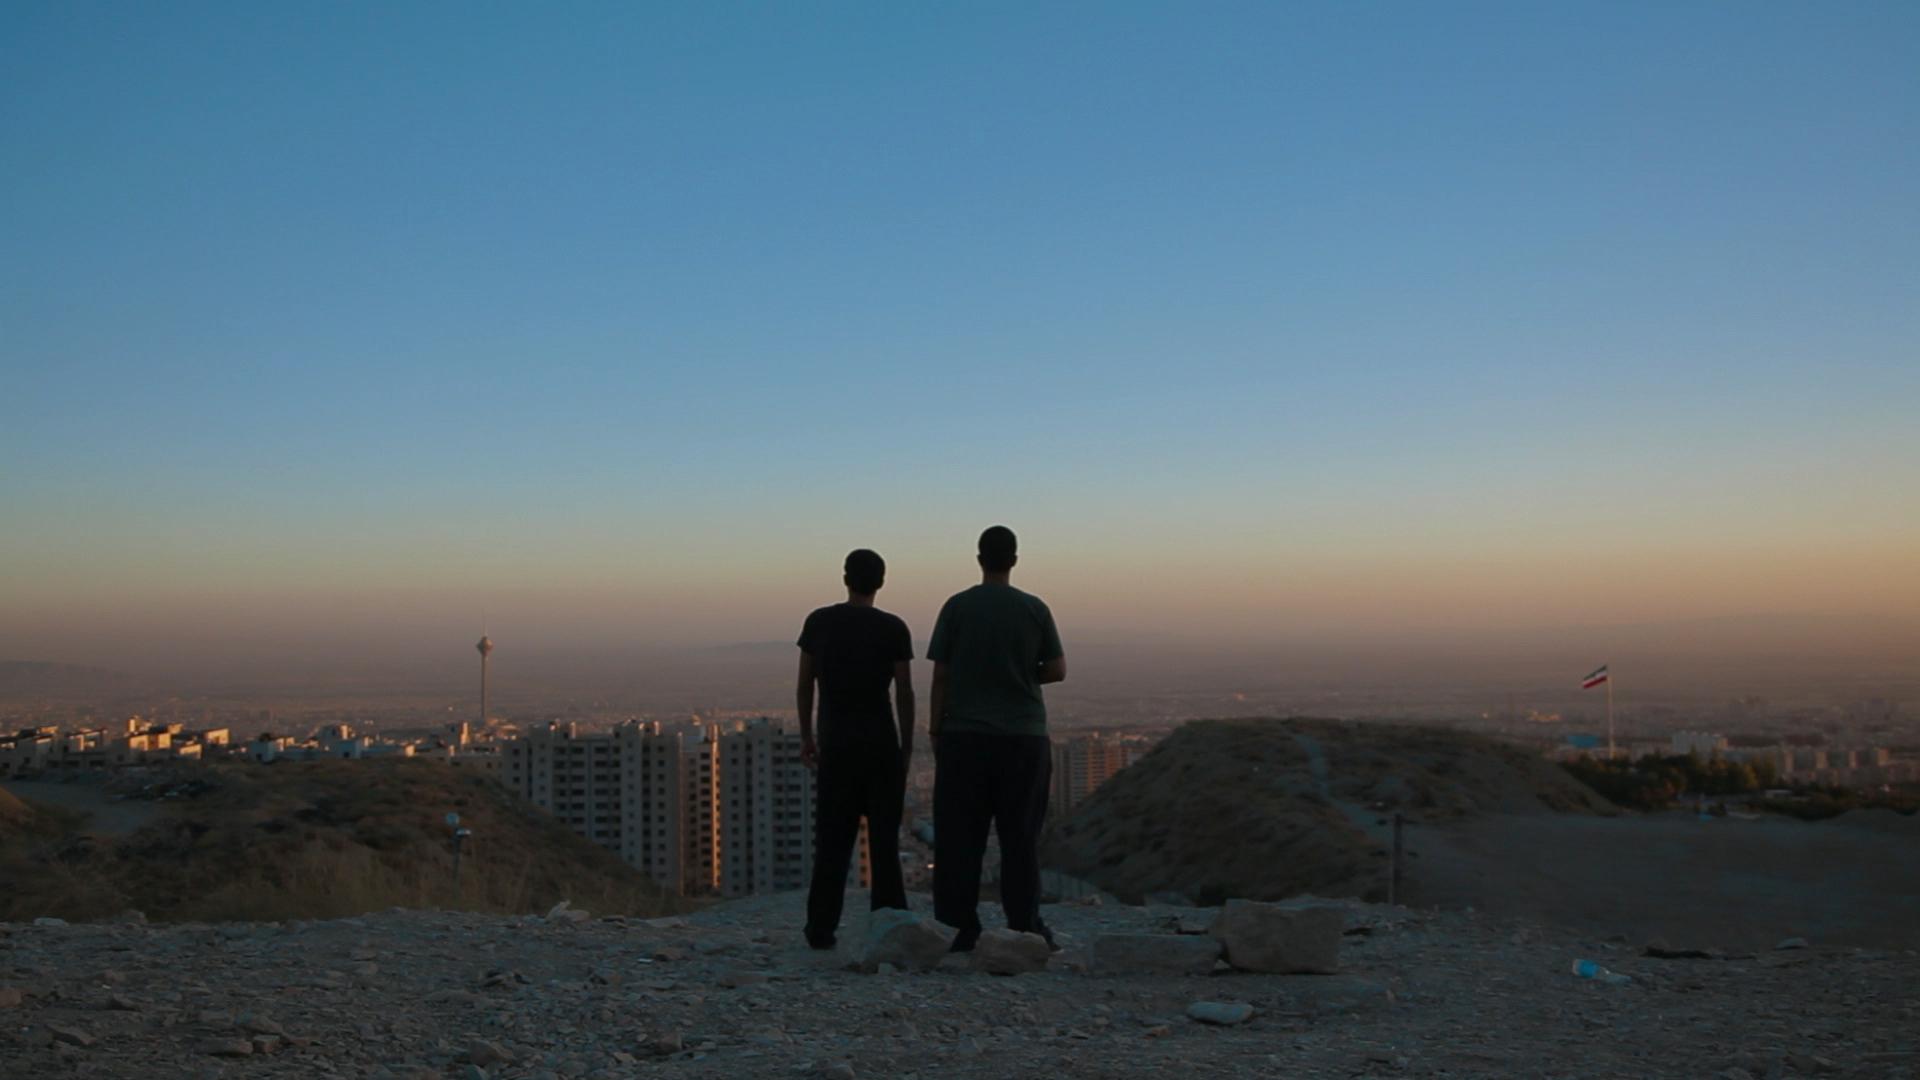 No More music, No More dancing in Iran